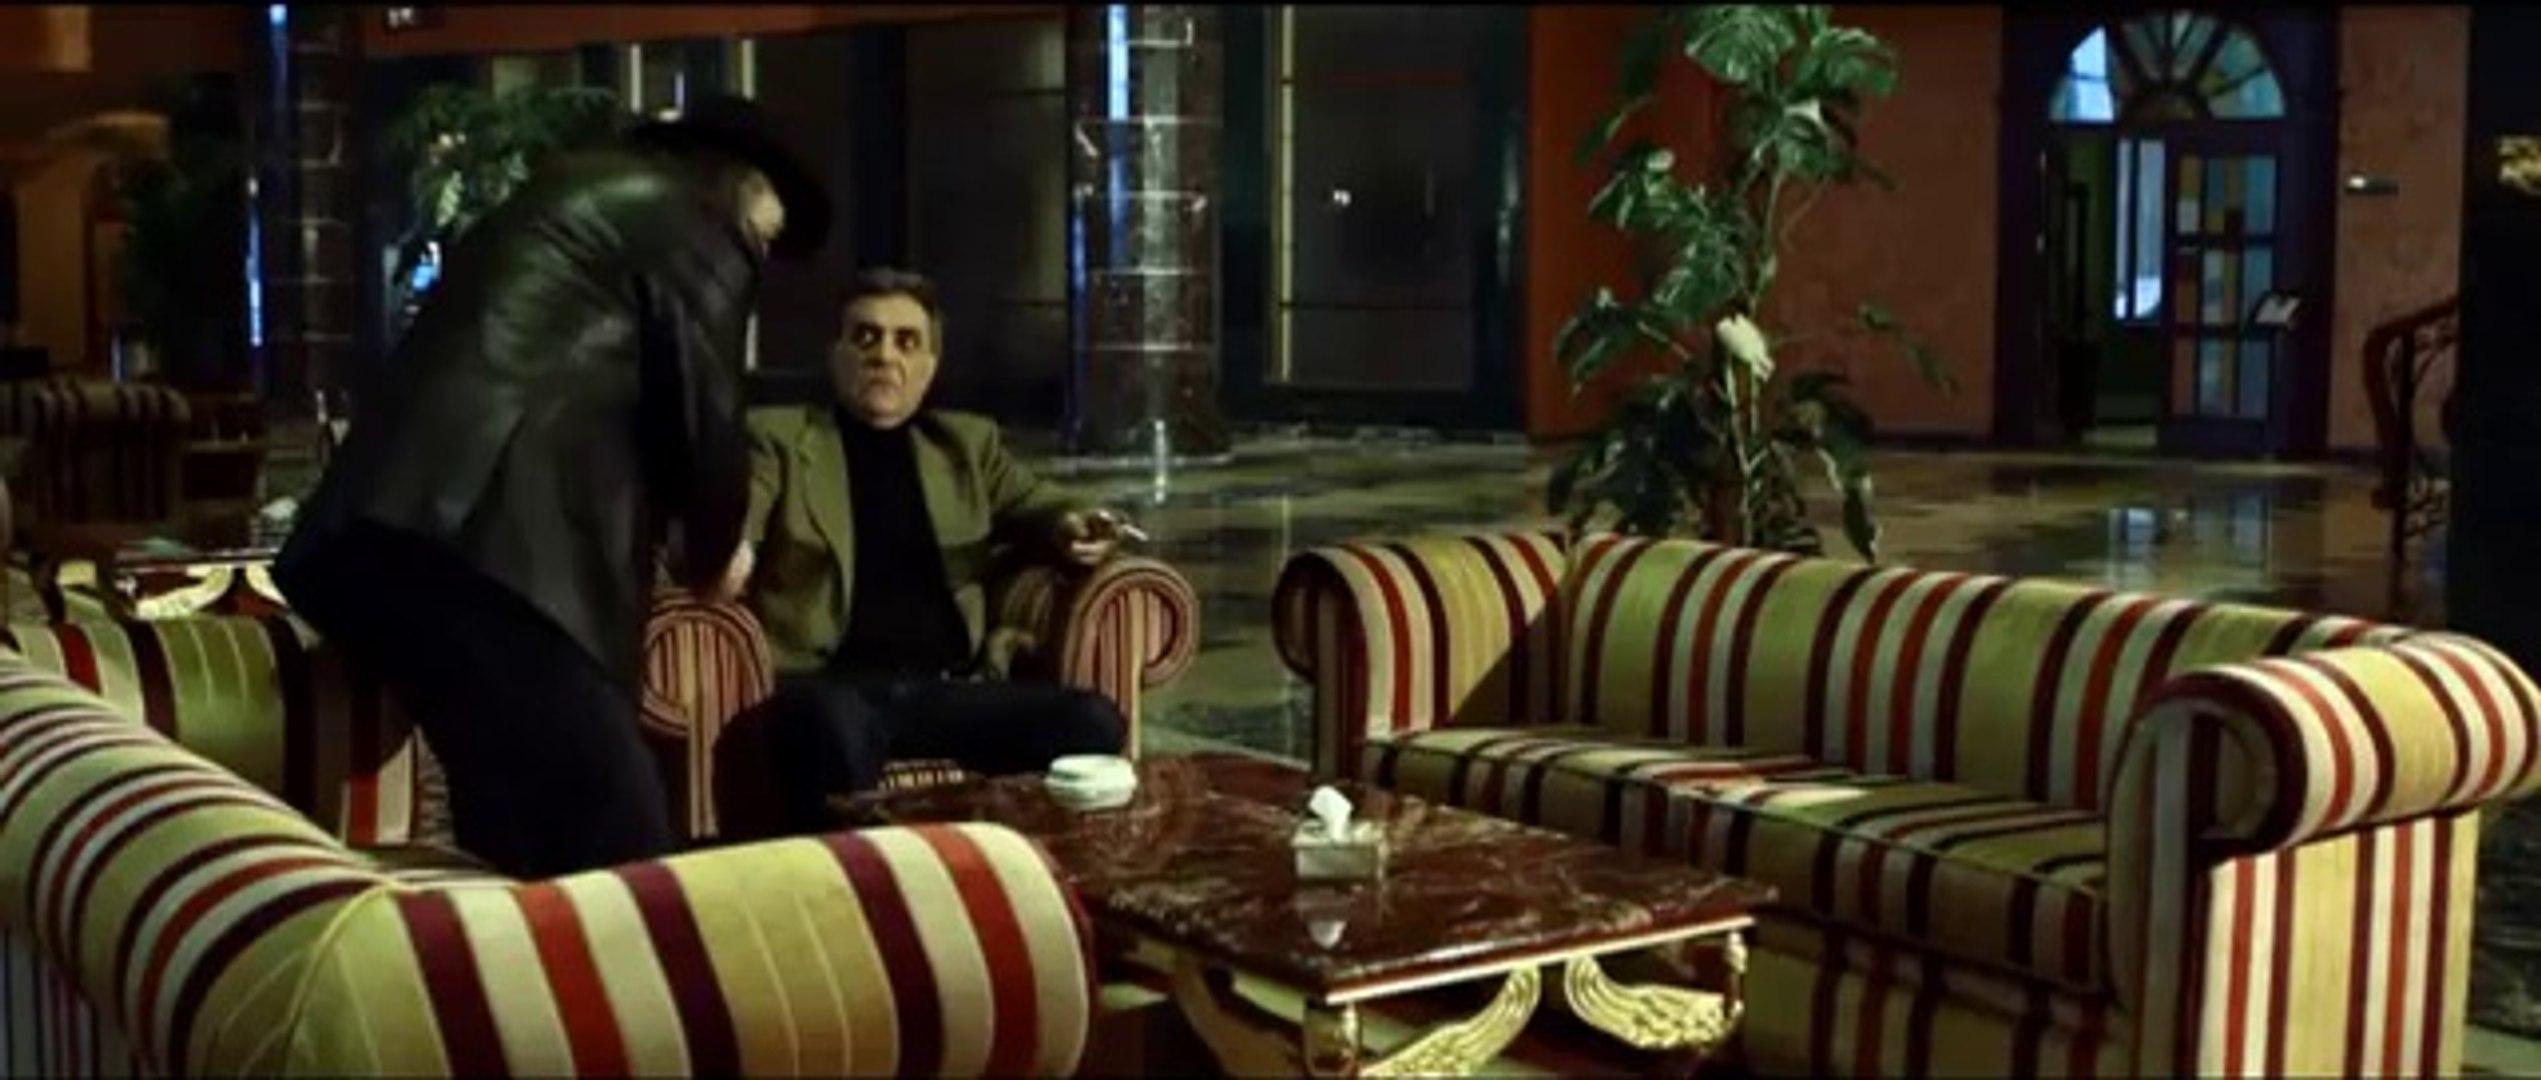 Смотреть онлайн армянский сериал Xaghic durs_6